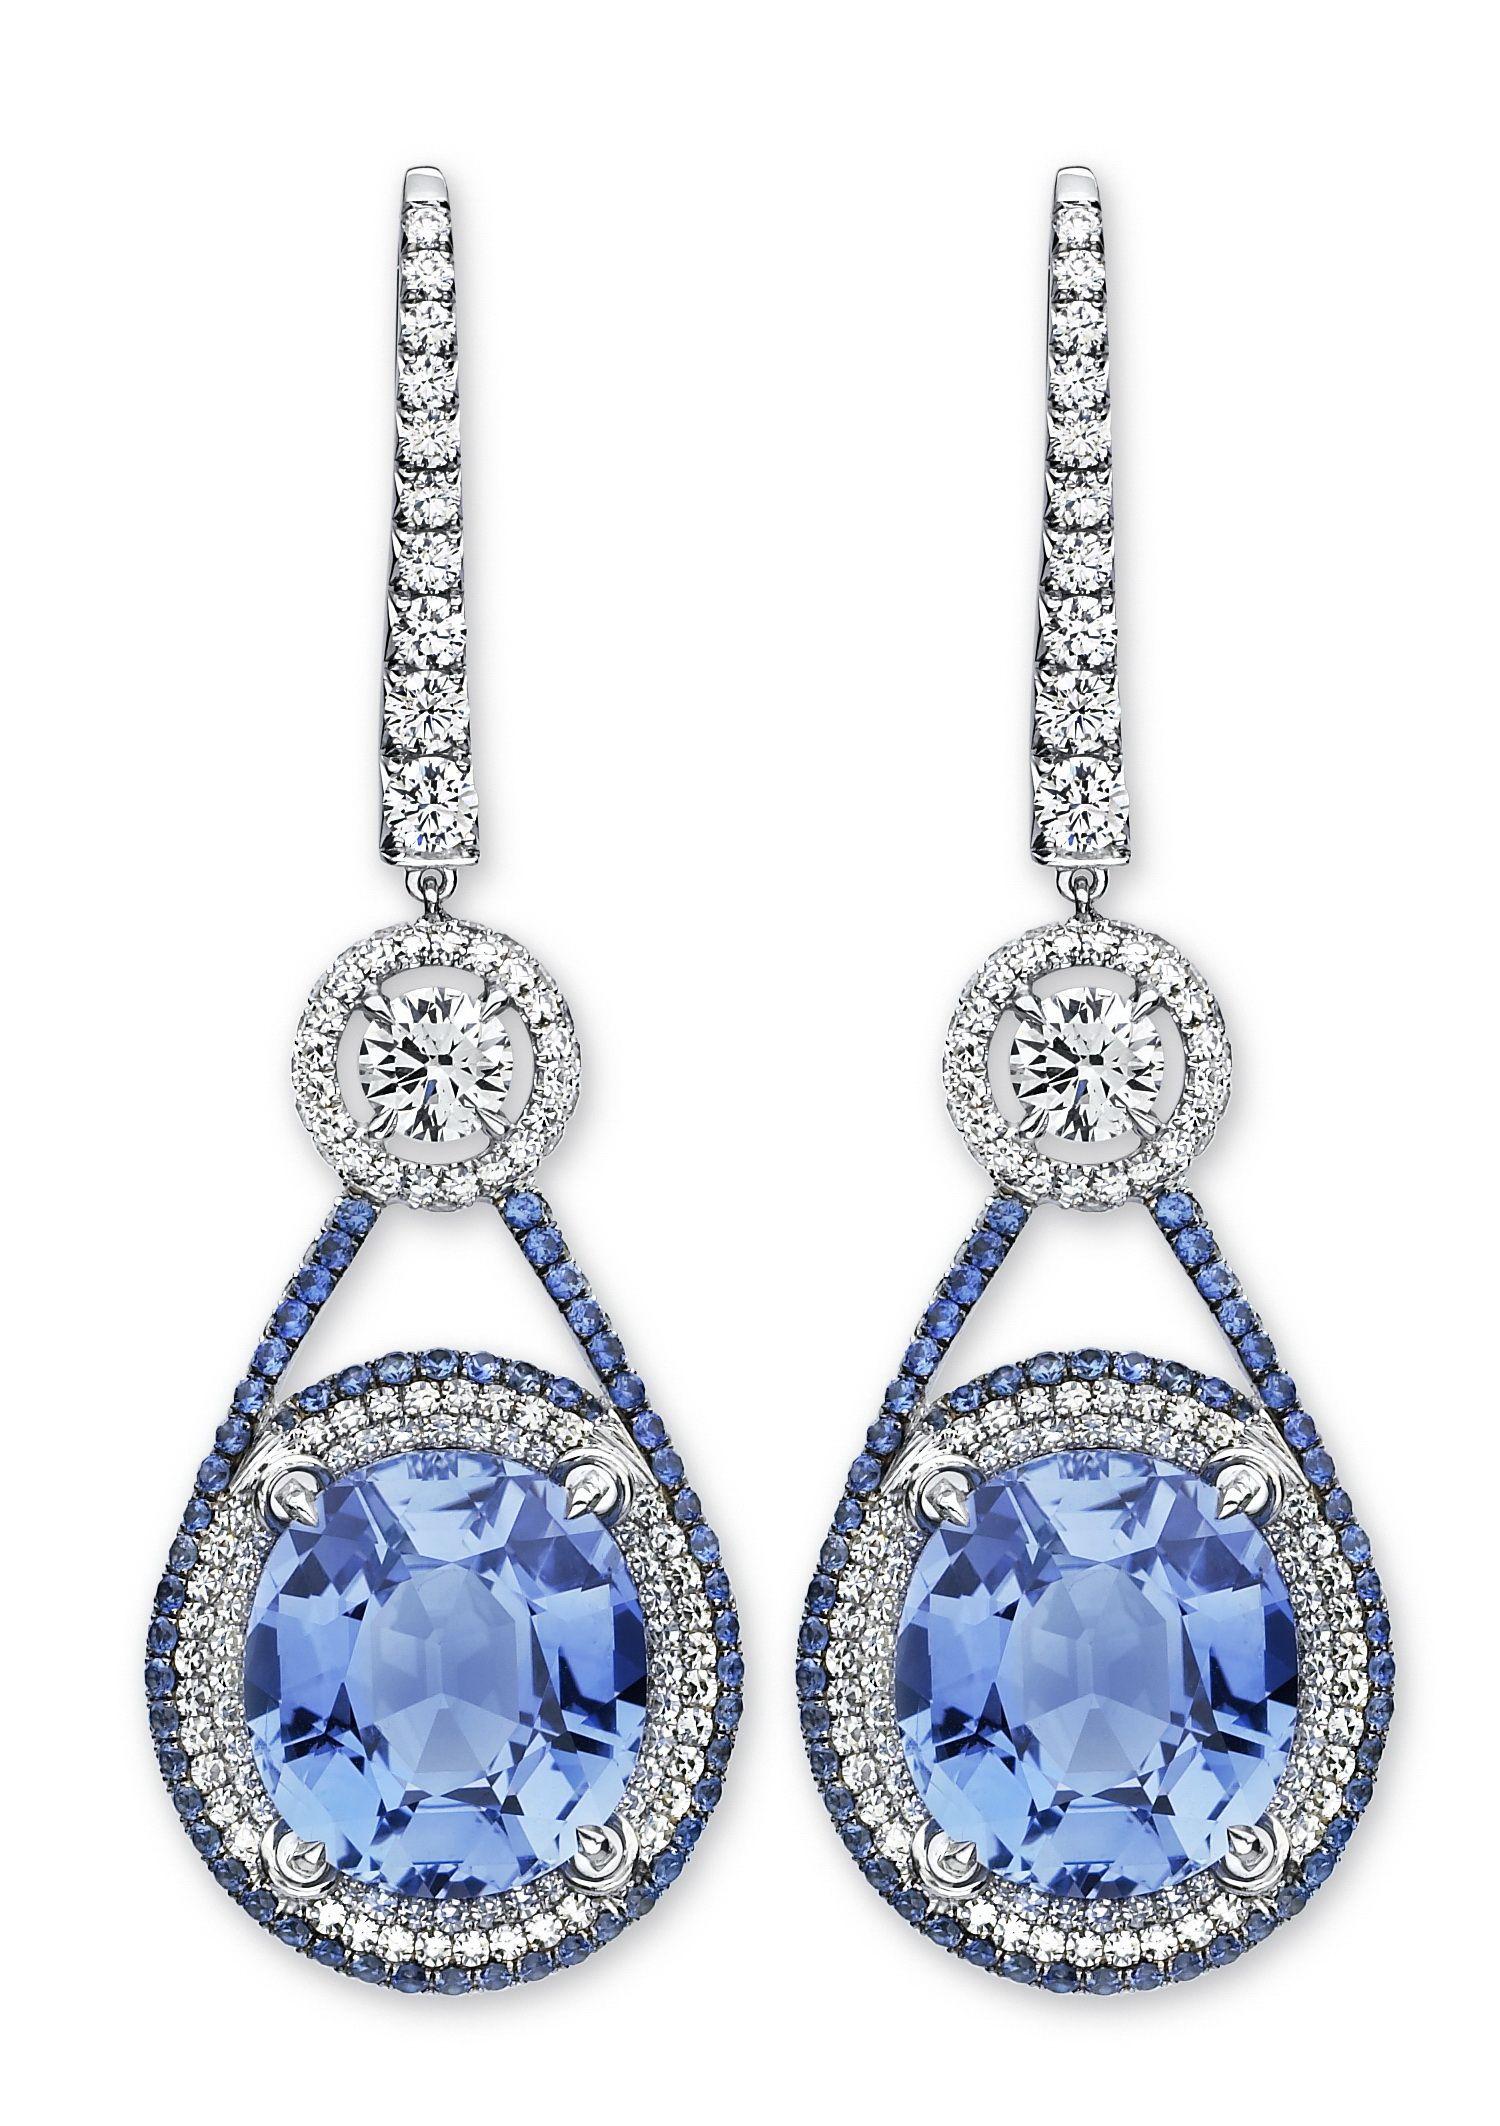 Martin Katz Cool Pastel Blue Sapphire And Diamond Drop Earrings Blue Diamond Earrings Sapphire Jewelry Earrings Sapphire And Diamond Earrings